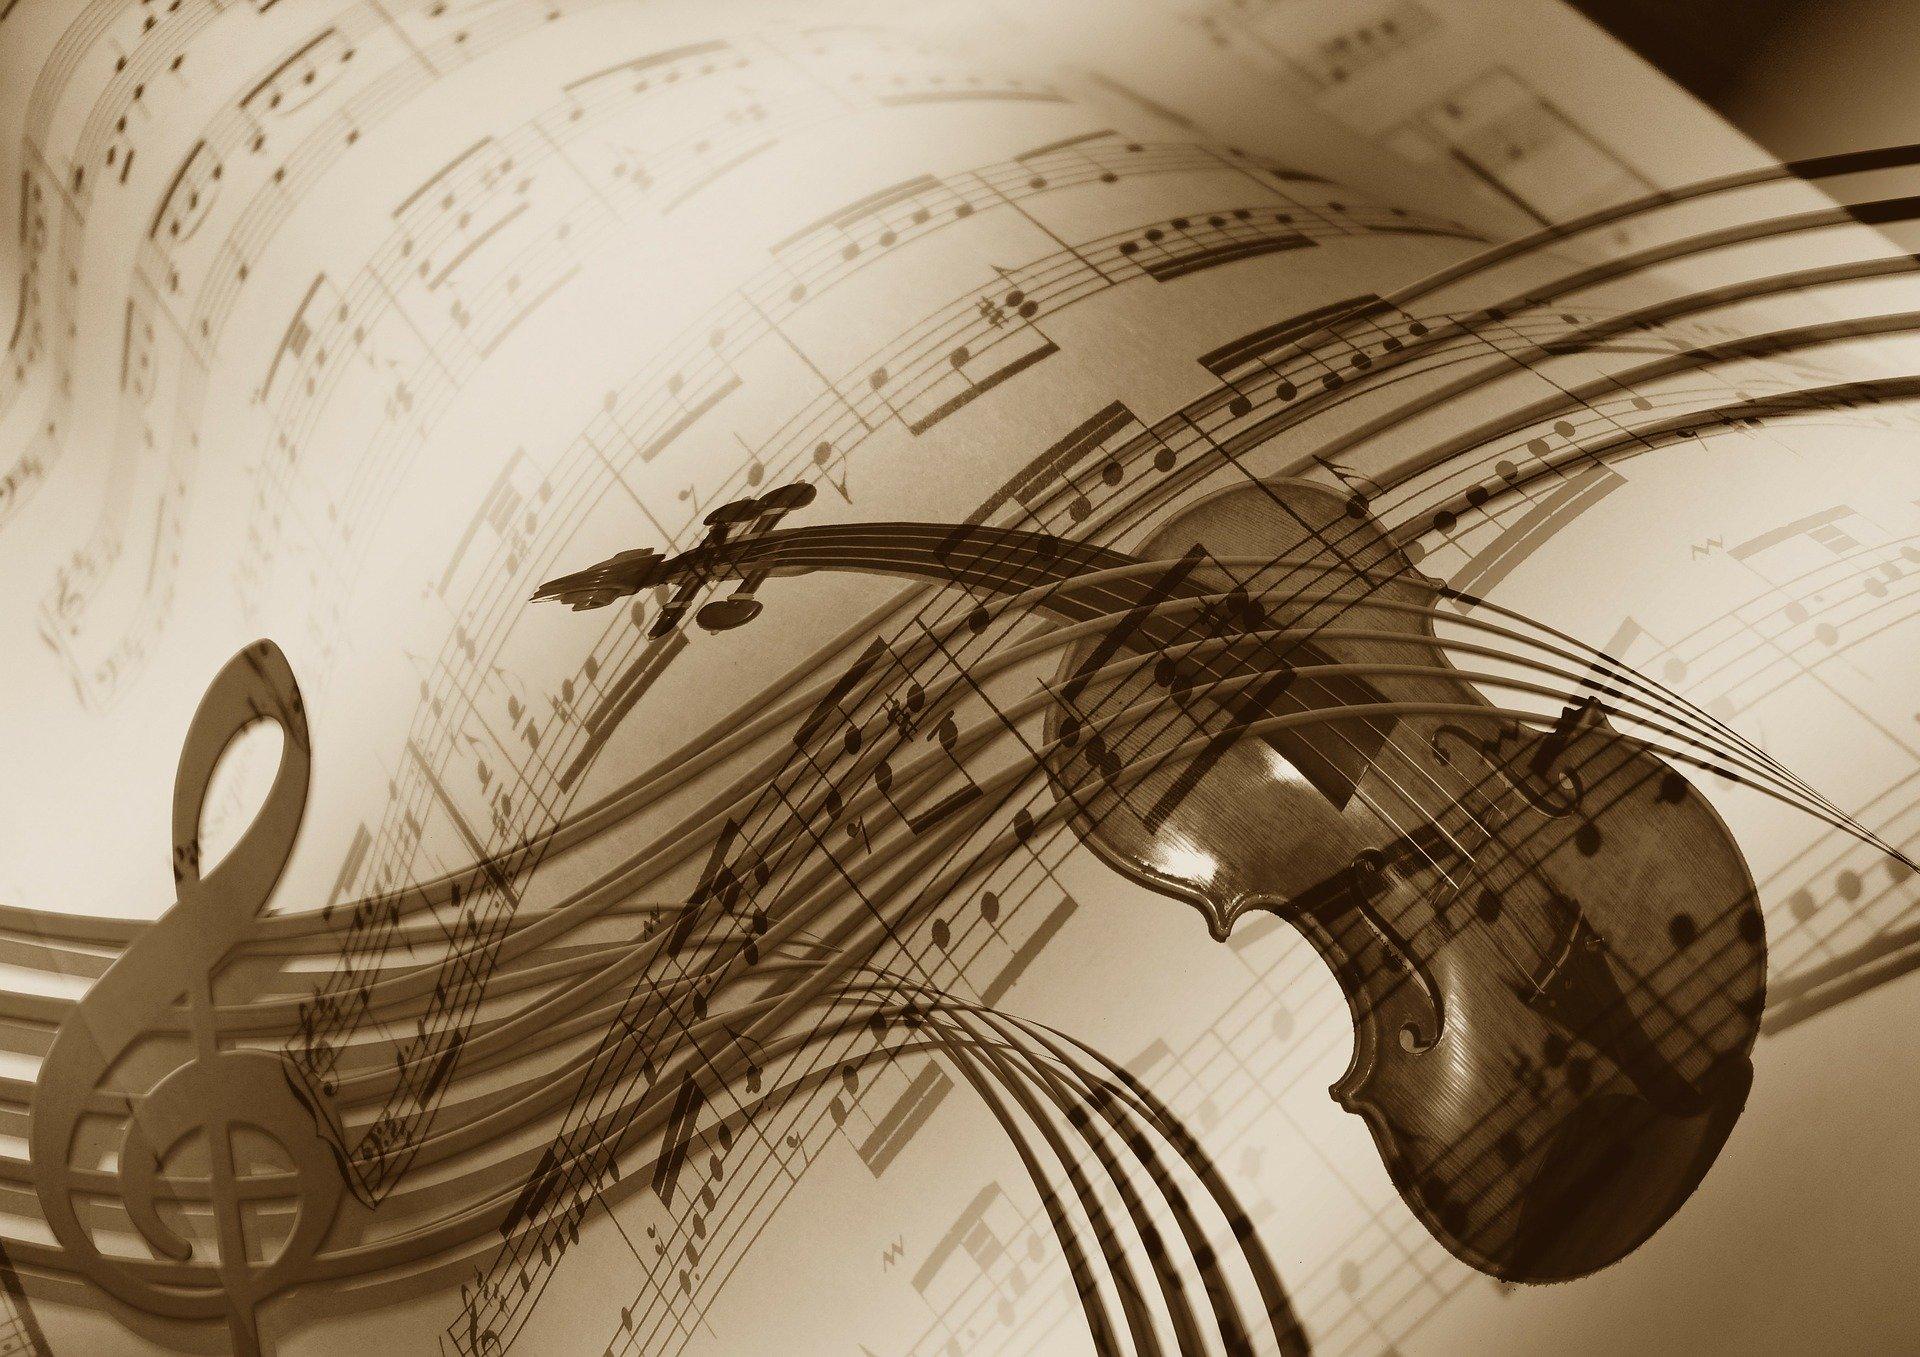 Картинки на тему музыка в жизни человека, приколы про